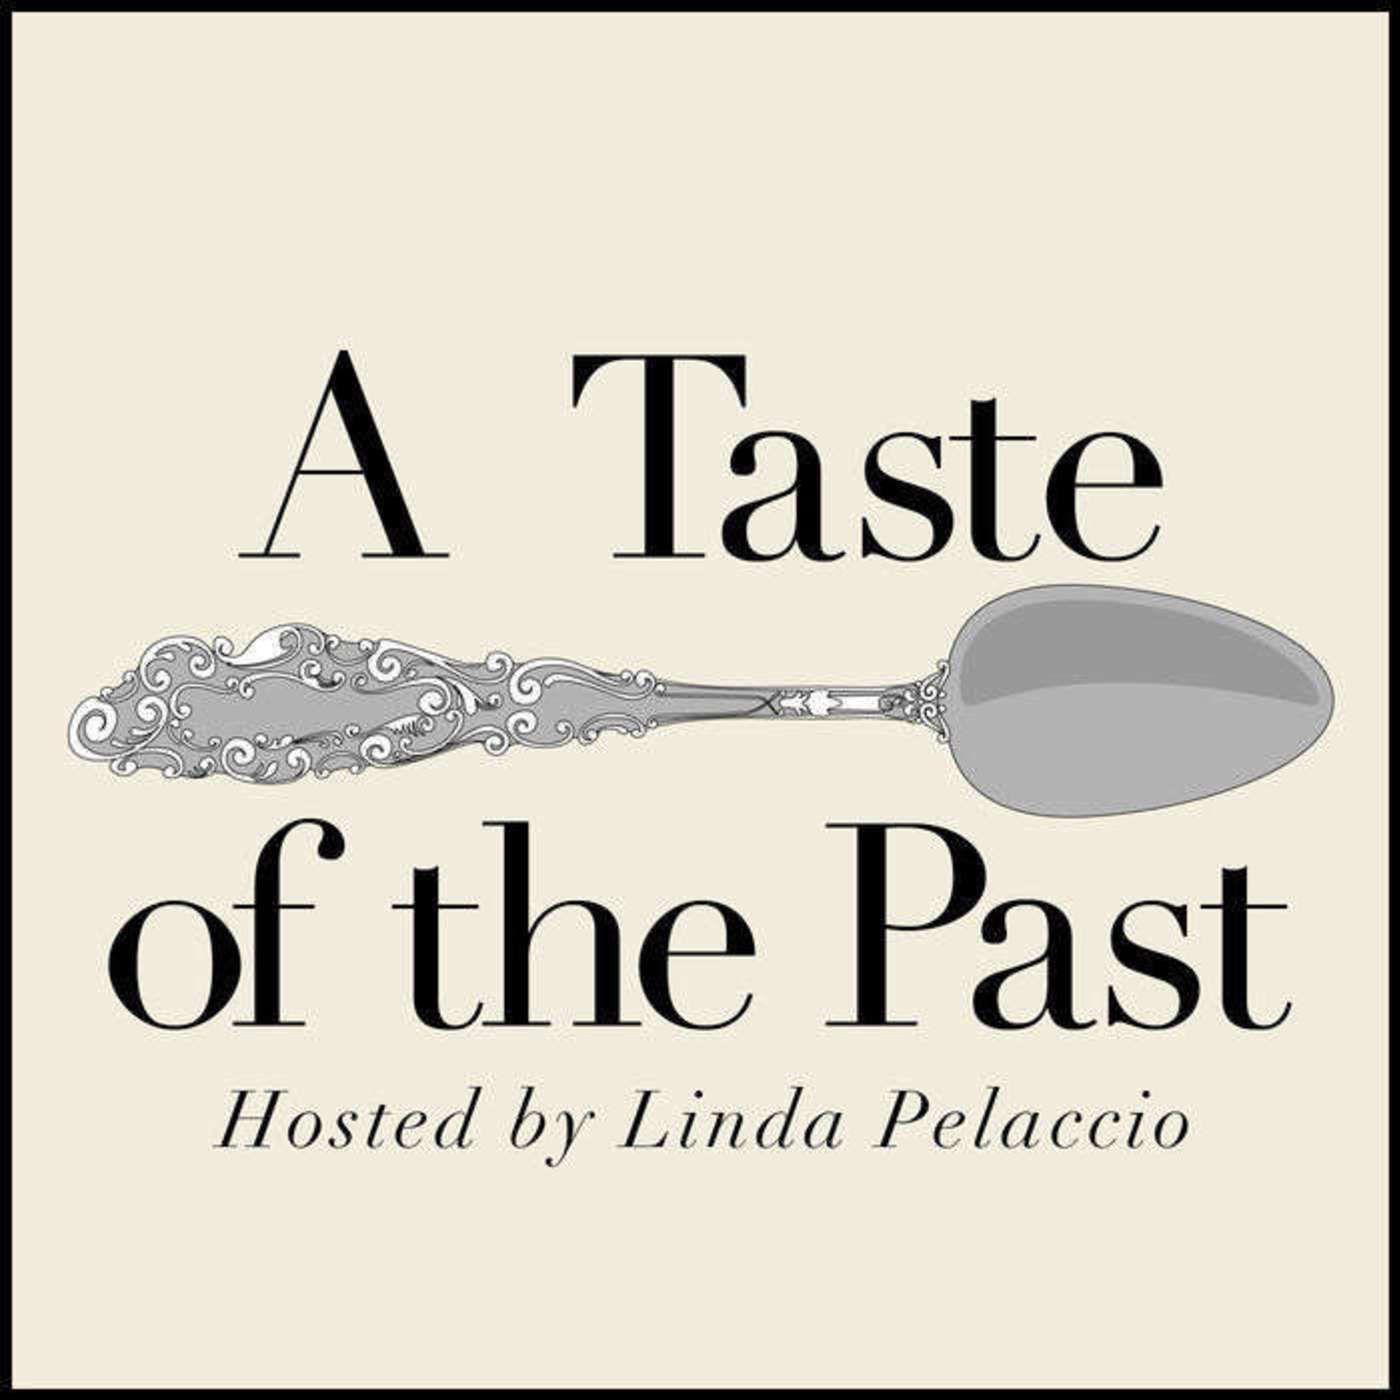 Episode 64: Italian Food: The Empire Strikes Again